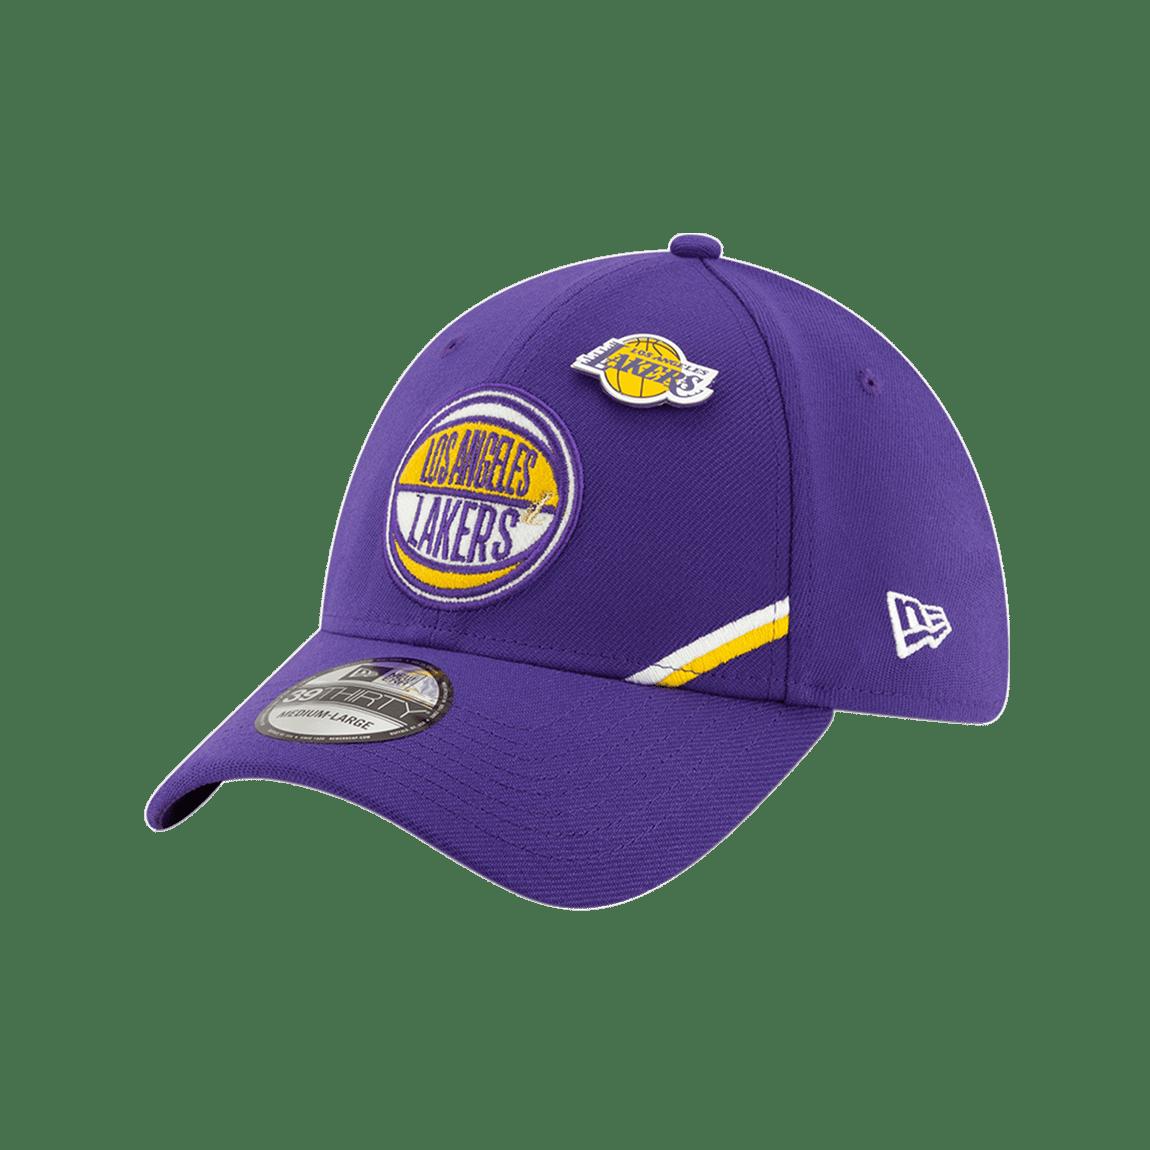 bfcc52526e25 Gorra New Era NBA 39THIRTY Los Ángeles Lakers Draft Series - martimx ...